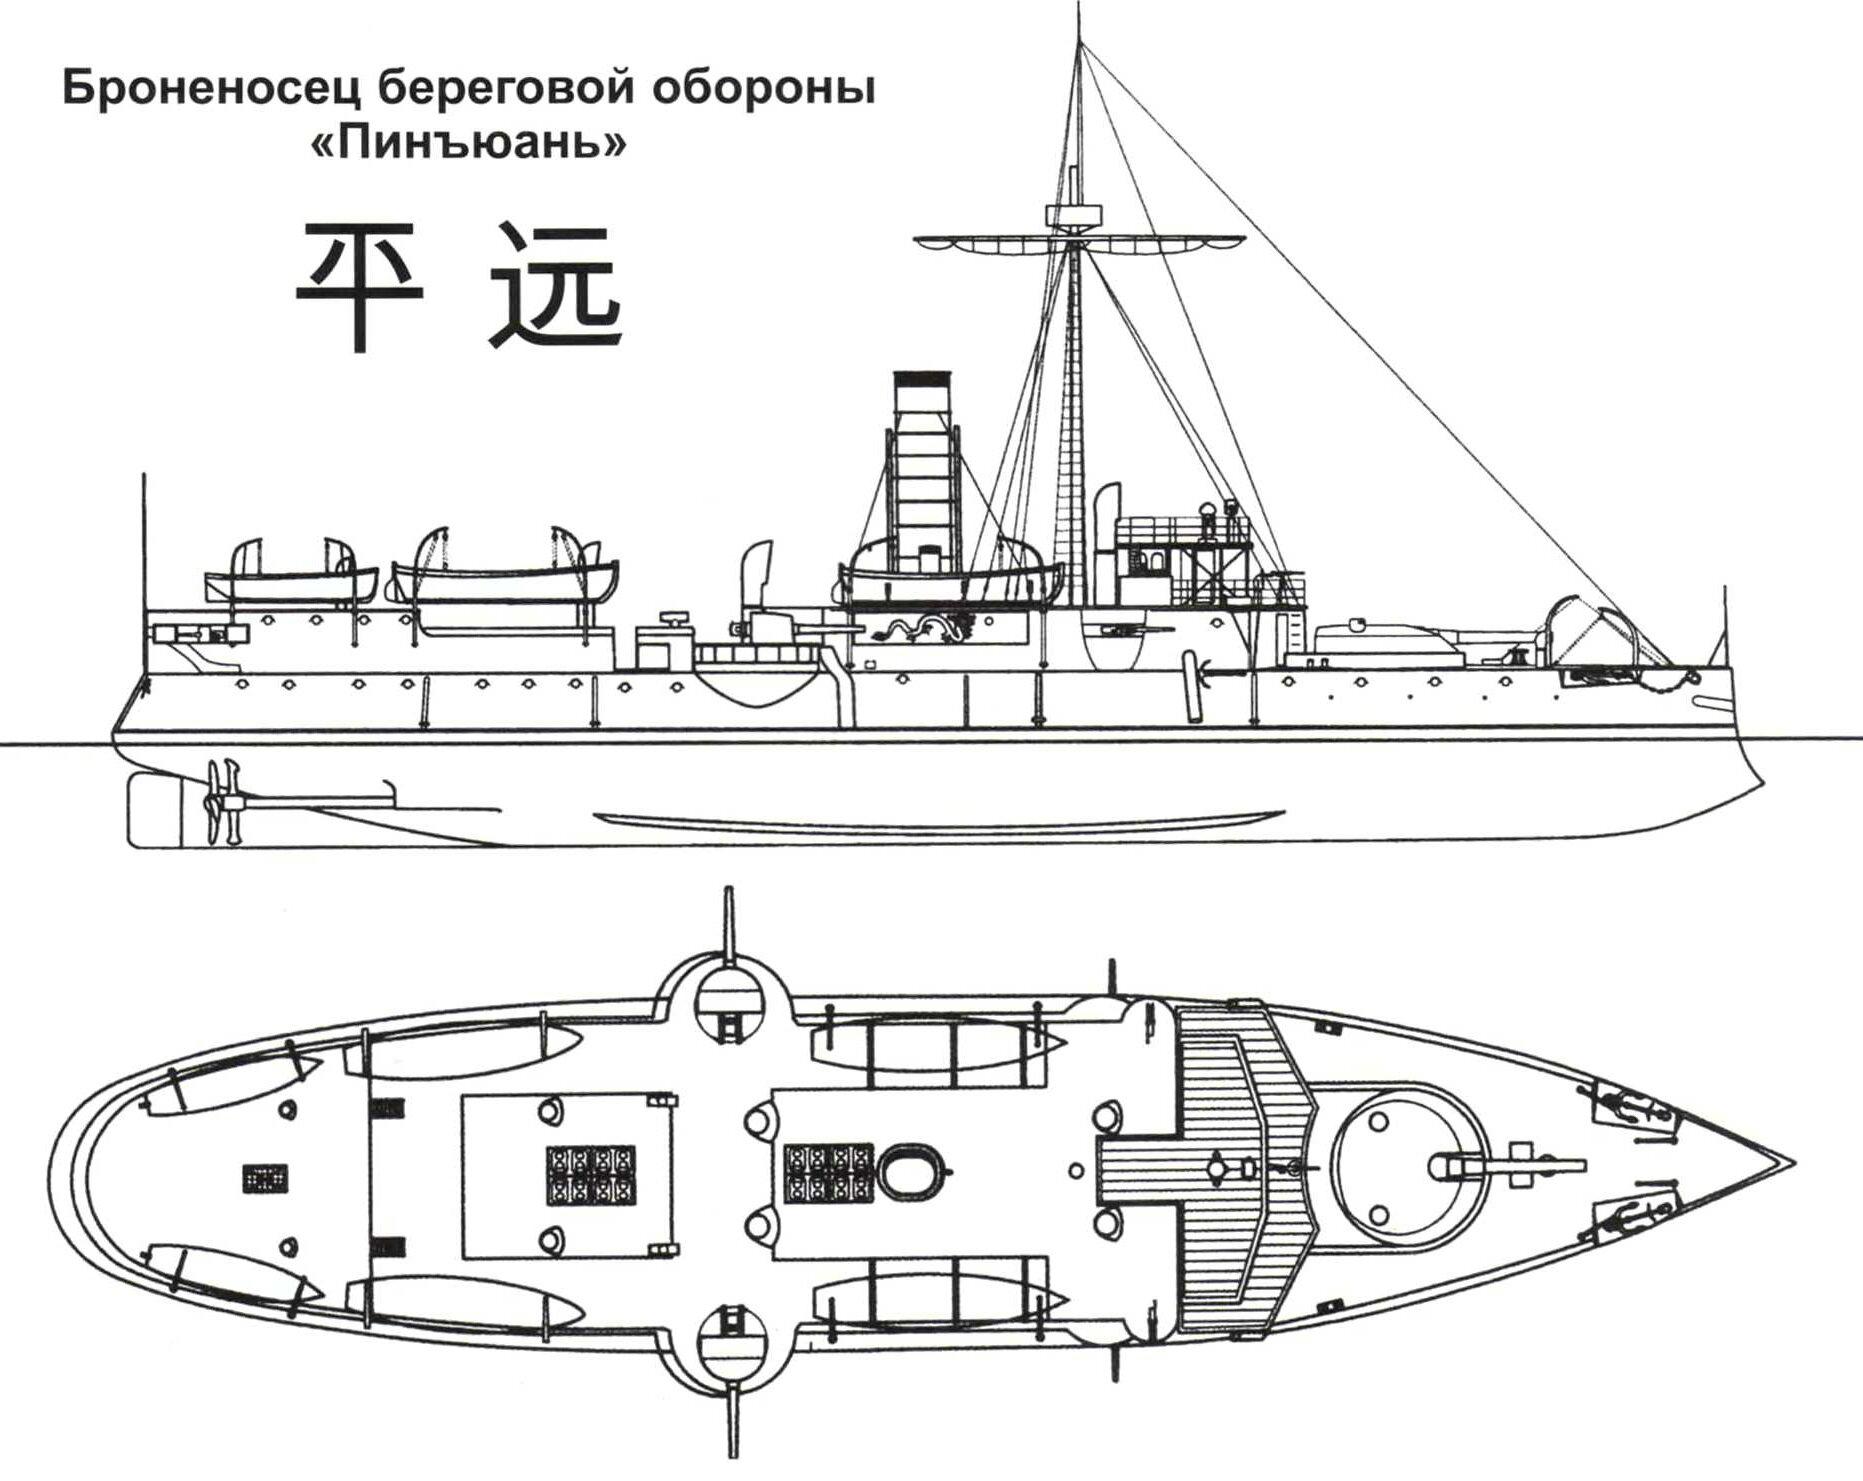 Броненосец береговой обороны «Пинъюань»